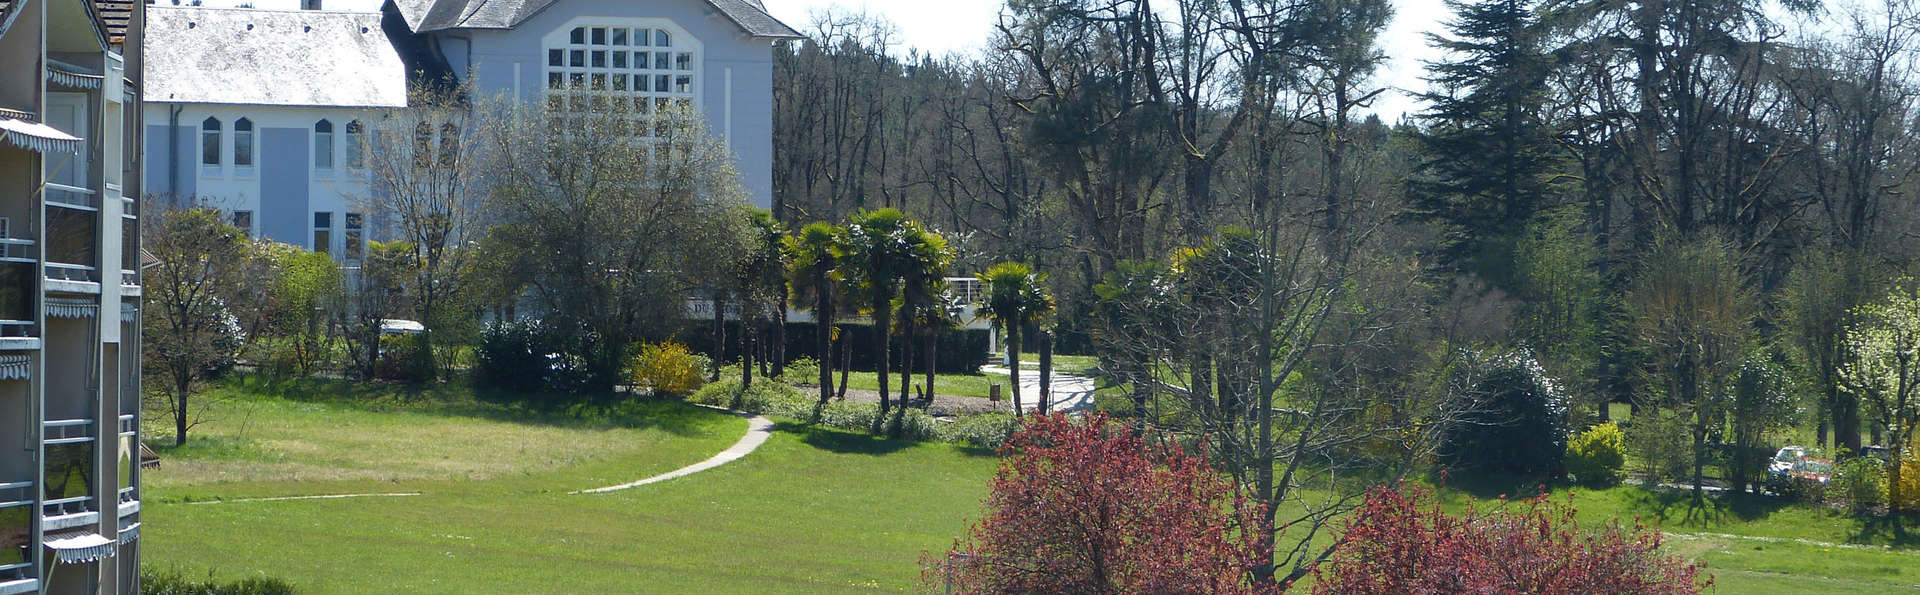 Appart Hotel Le Splendid  - p1040728.jpg